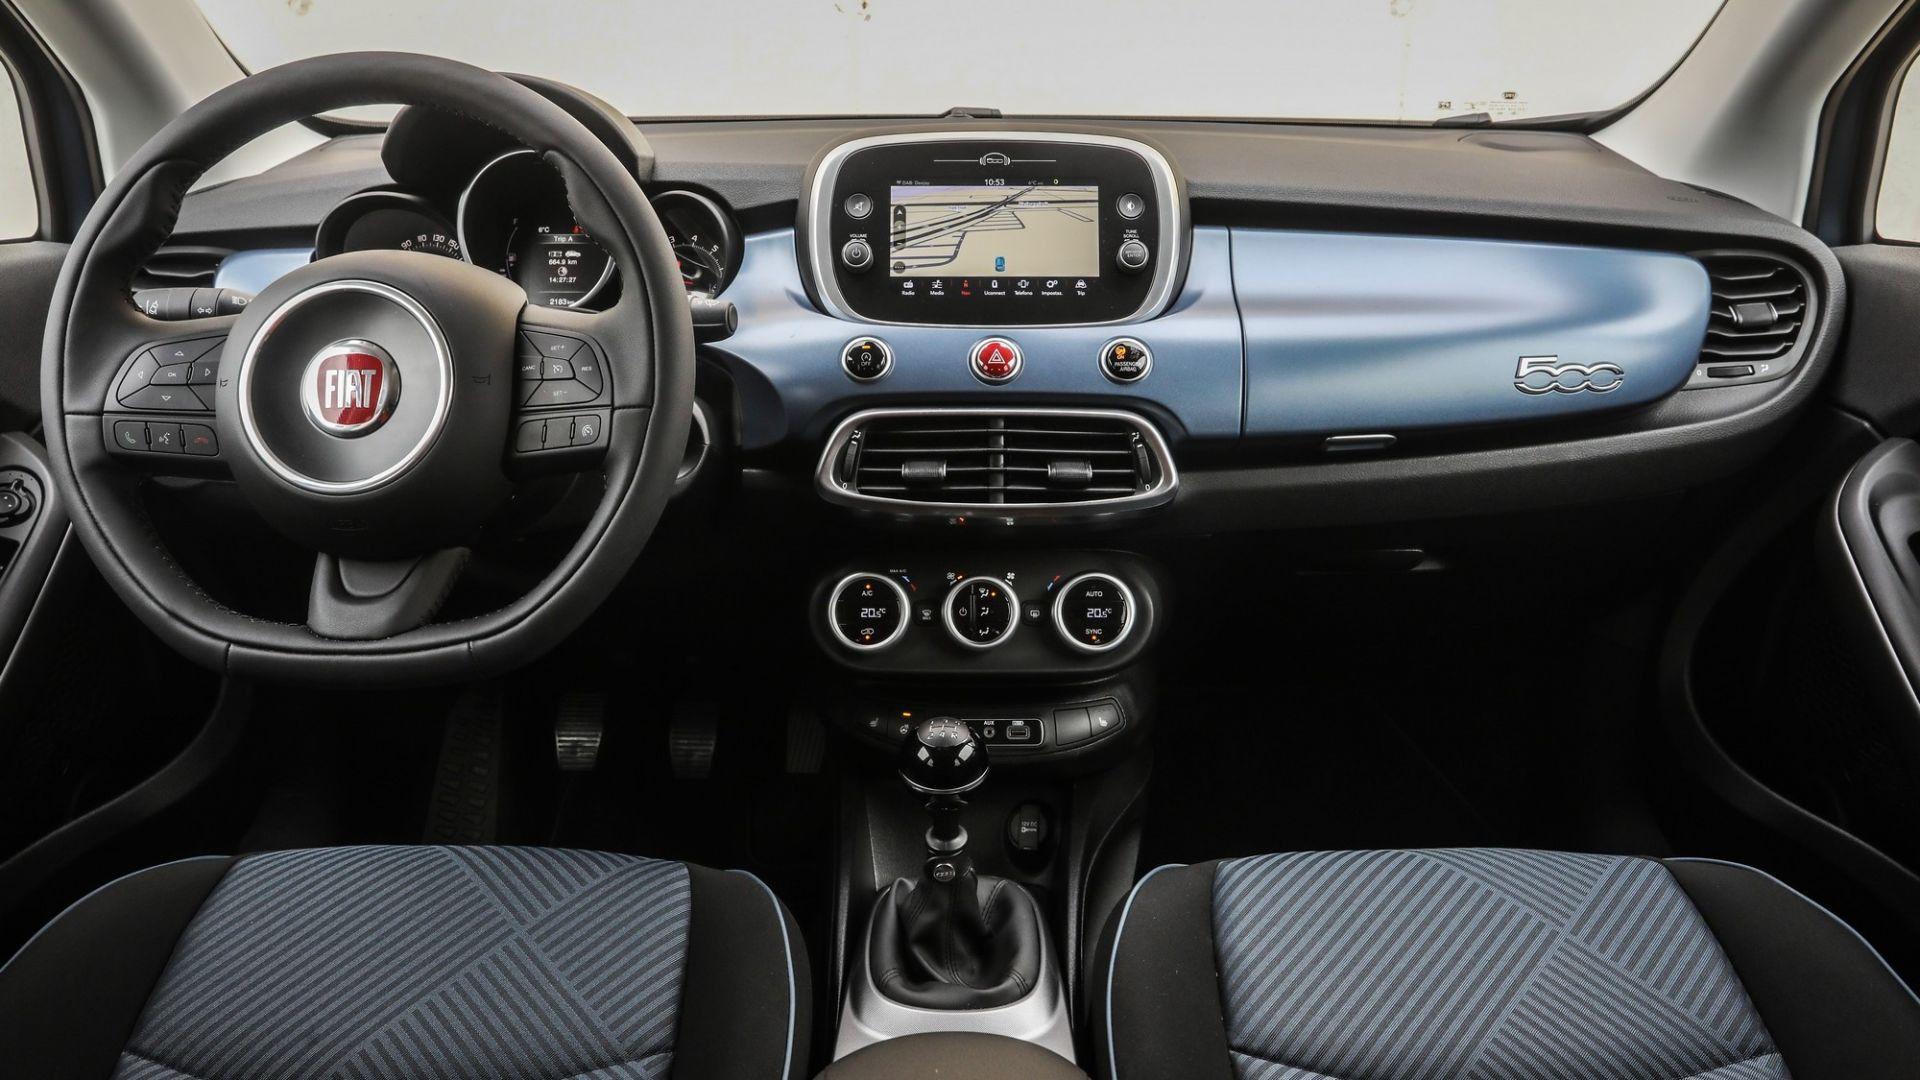 Fiat 500X Crossover >> Fiat 500X 1.6 vs Volkswagen T-Roc 1.0 TSI: prova, misure ...